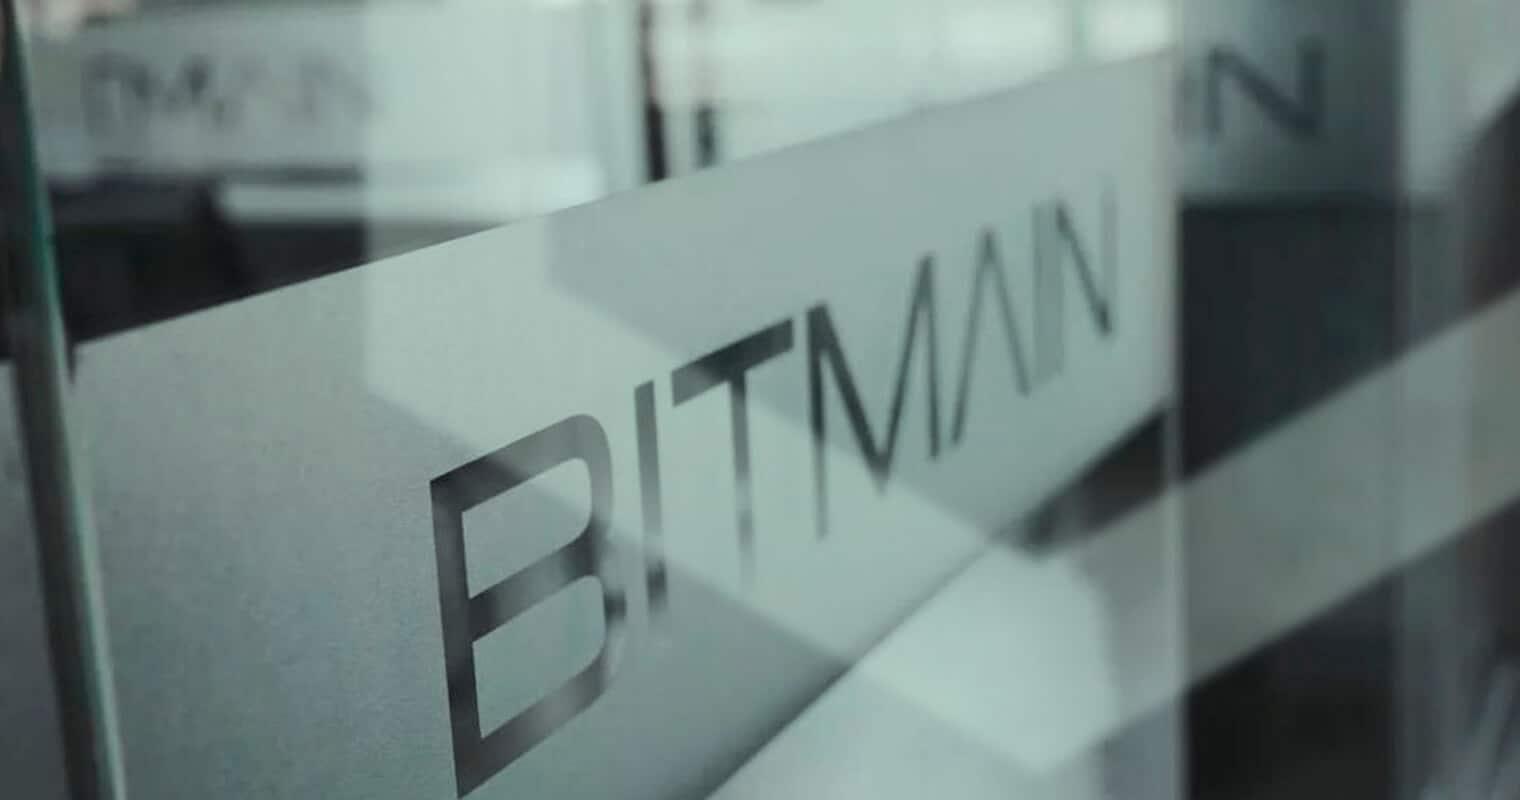 Bitmain Technologies to Build A 300MW Mining Farm in Texas